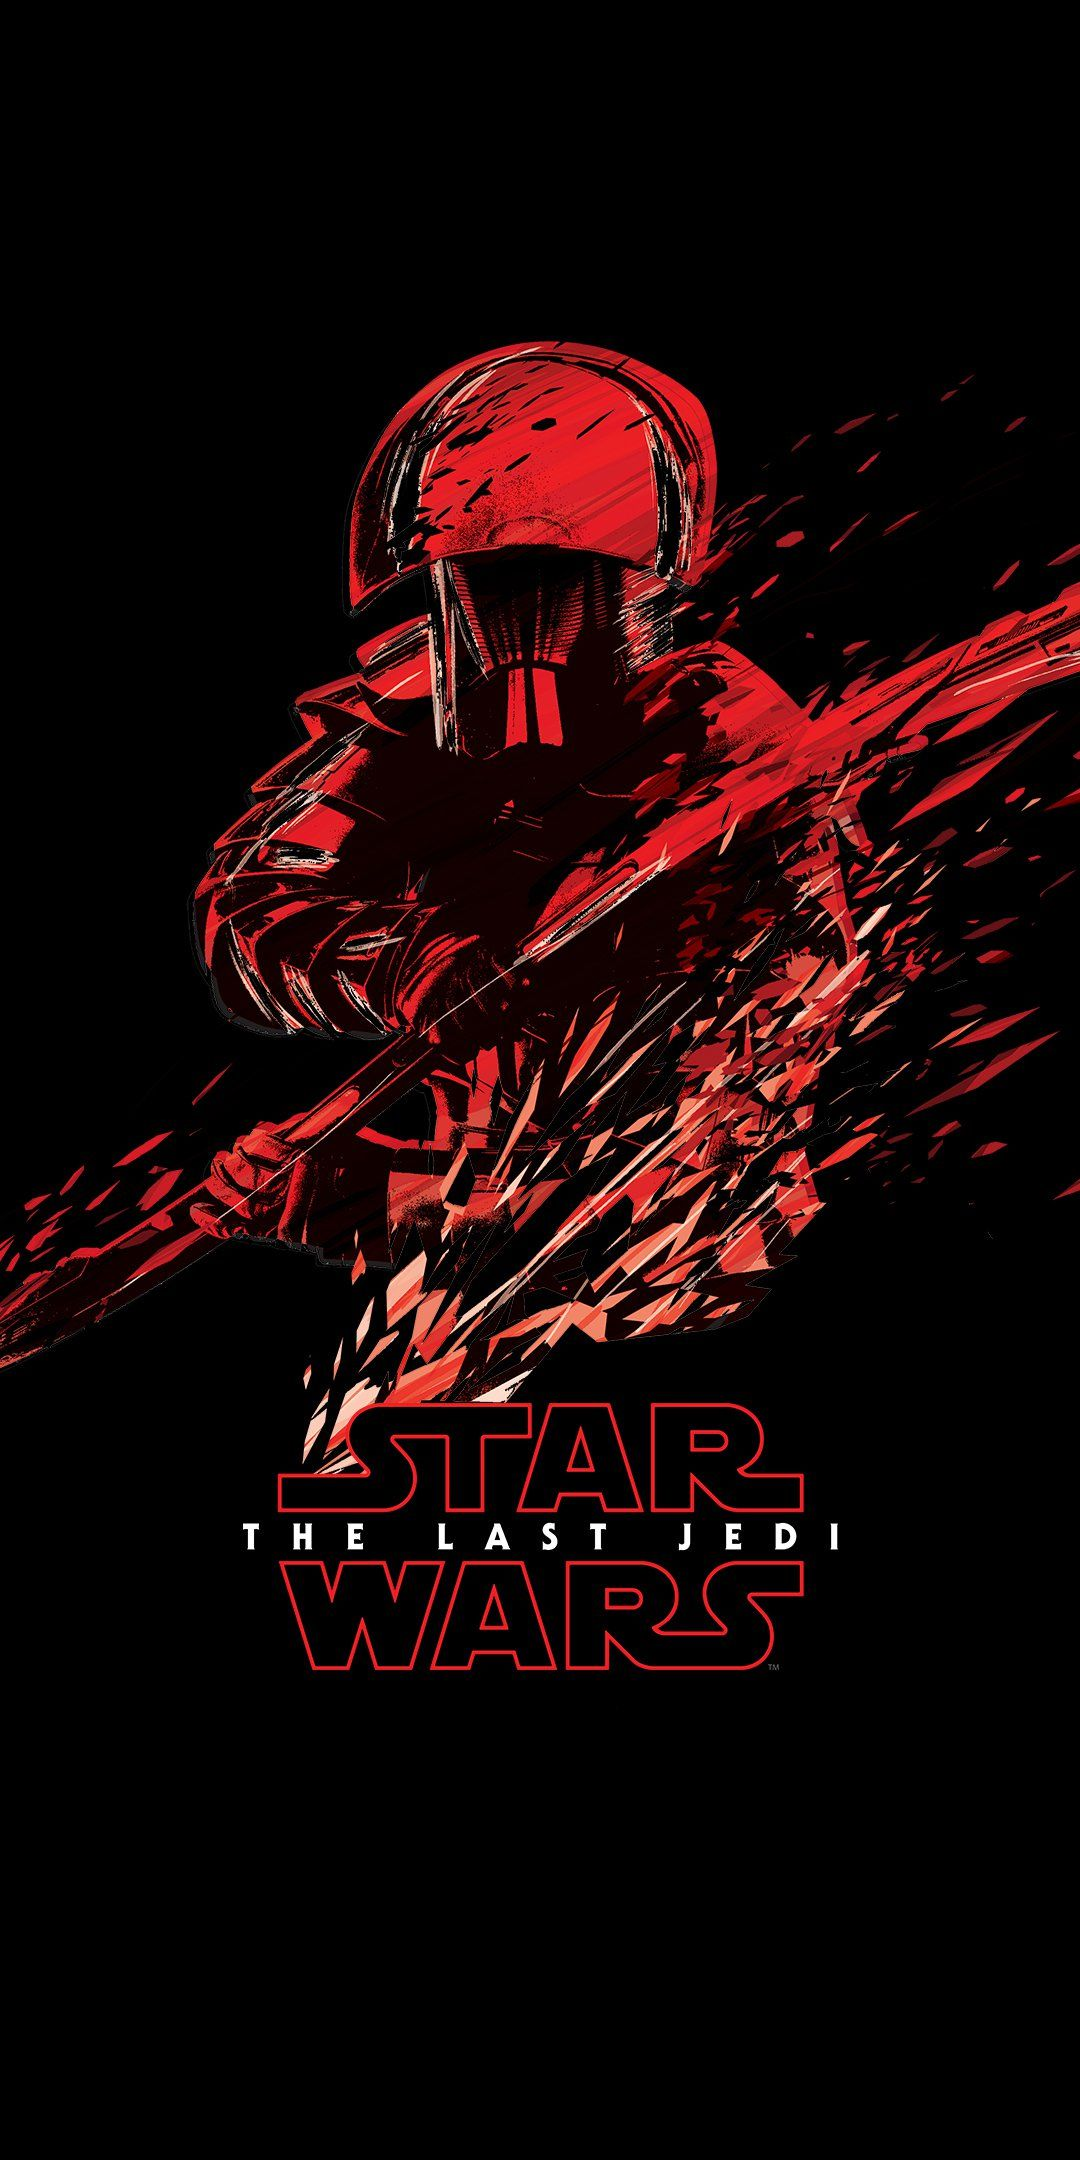 Amoled Wallpaper 15 Star Wars Wallpaper Star Wars Art Star Wars Poster